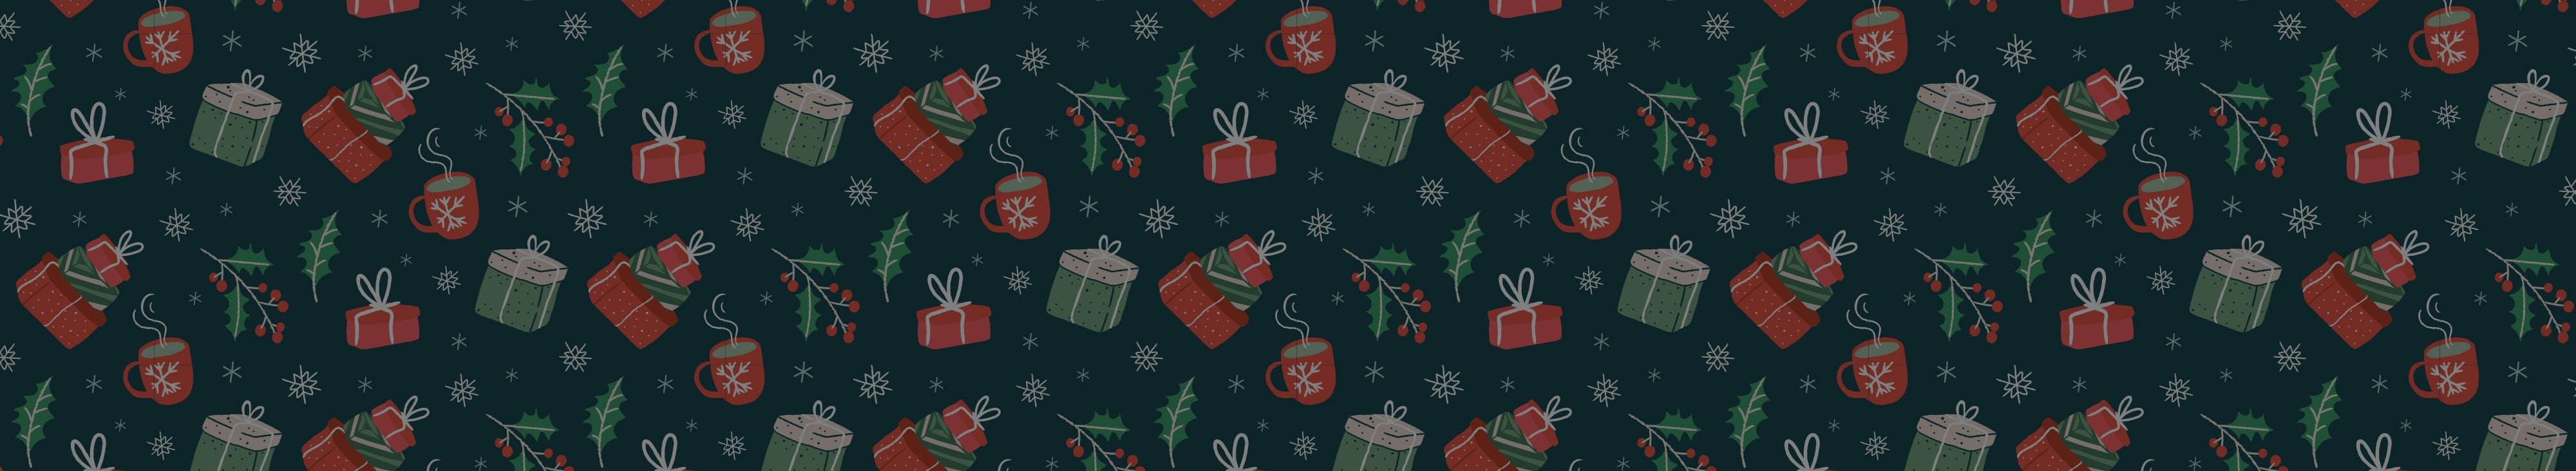 Christmas Background for header